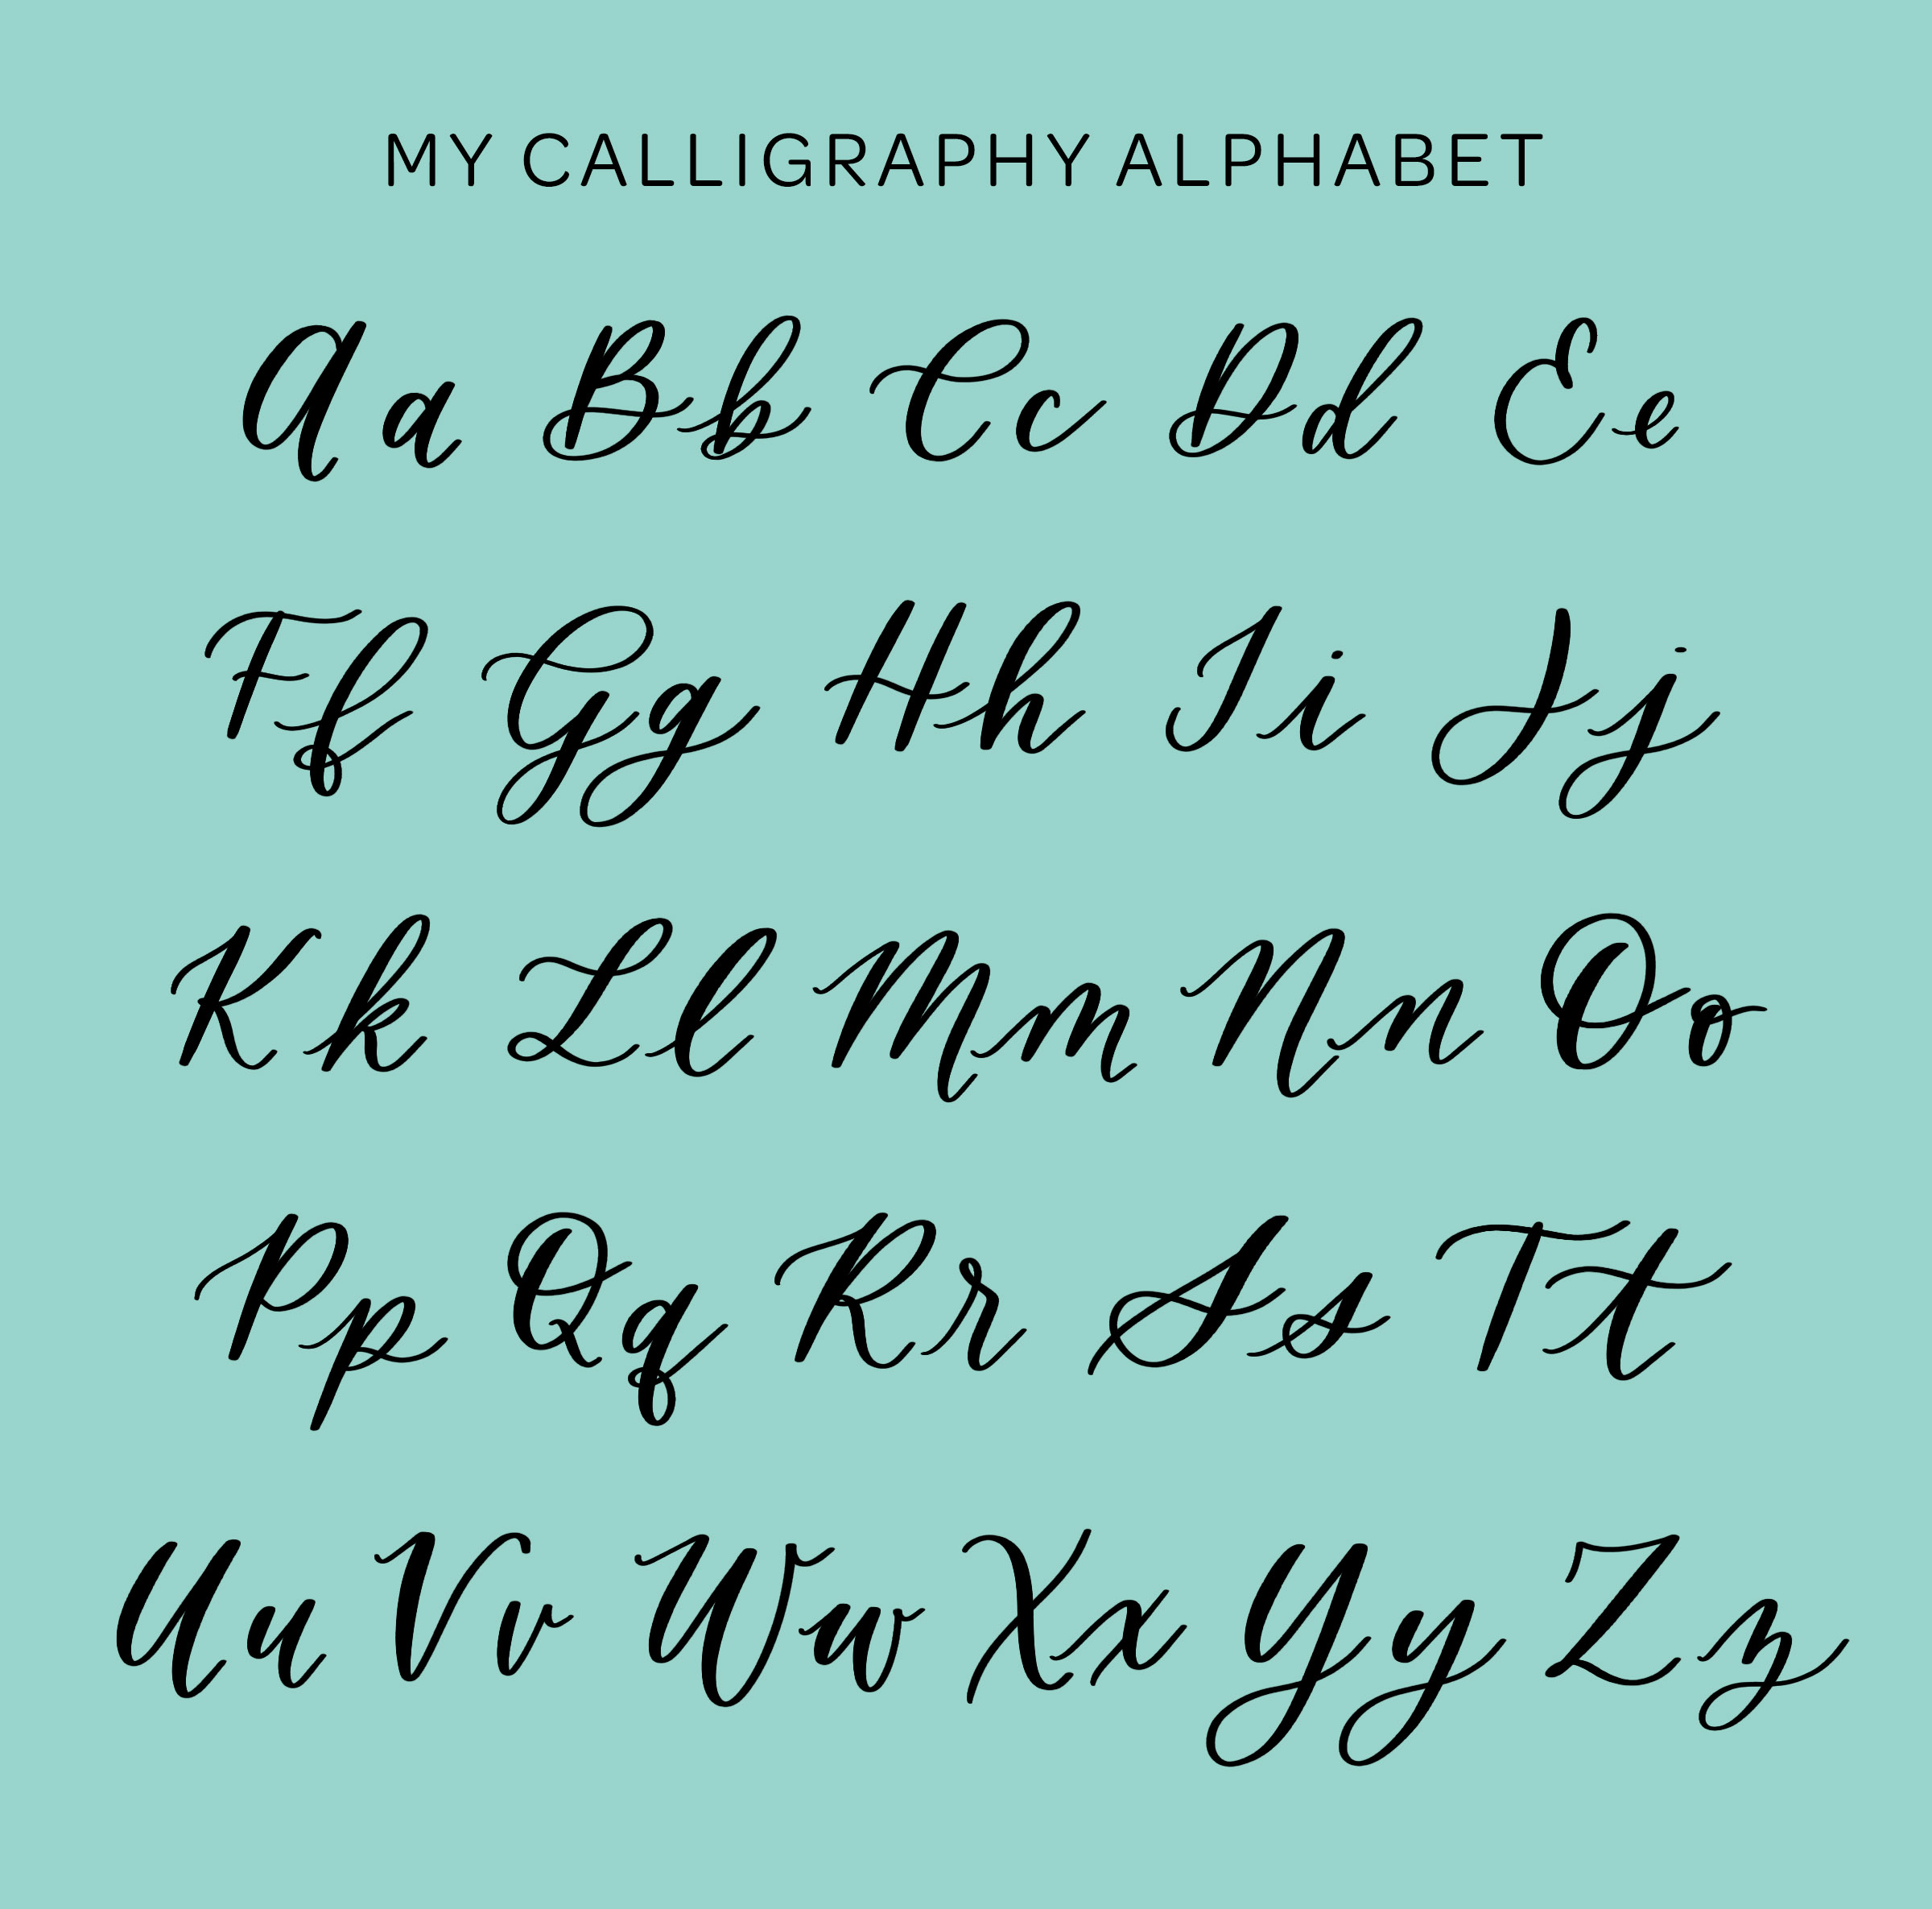 calliraphy alphabet.jpg